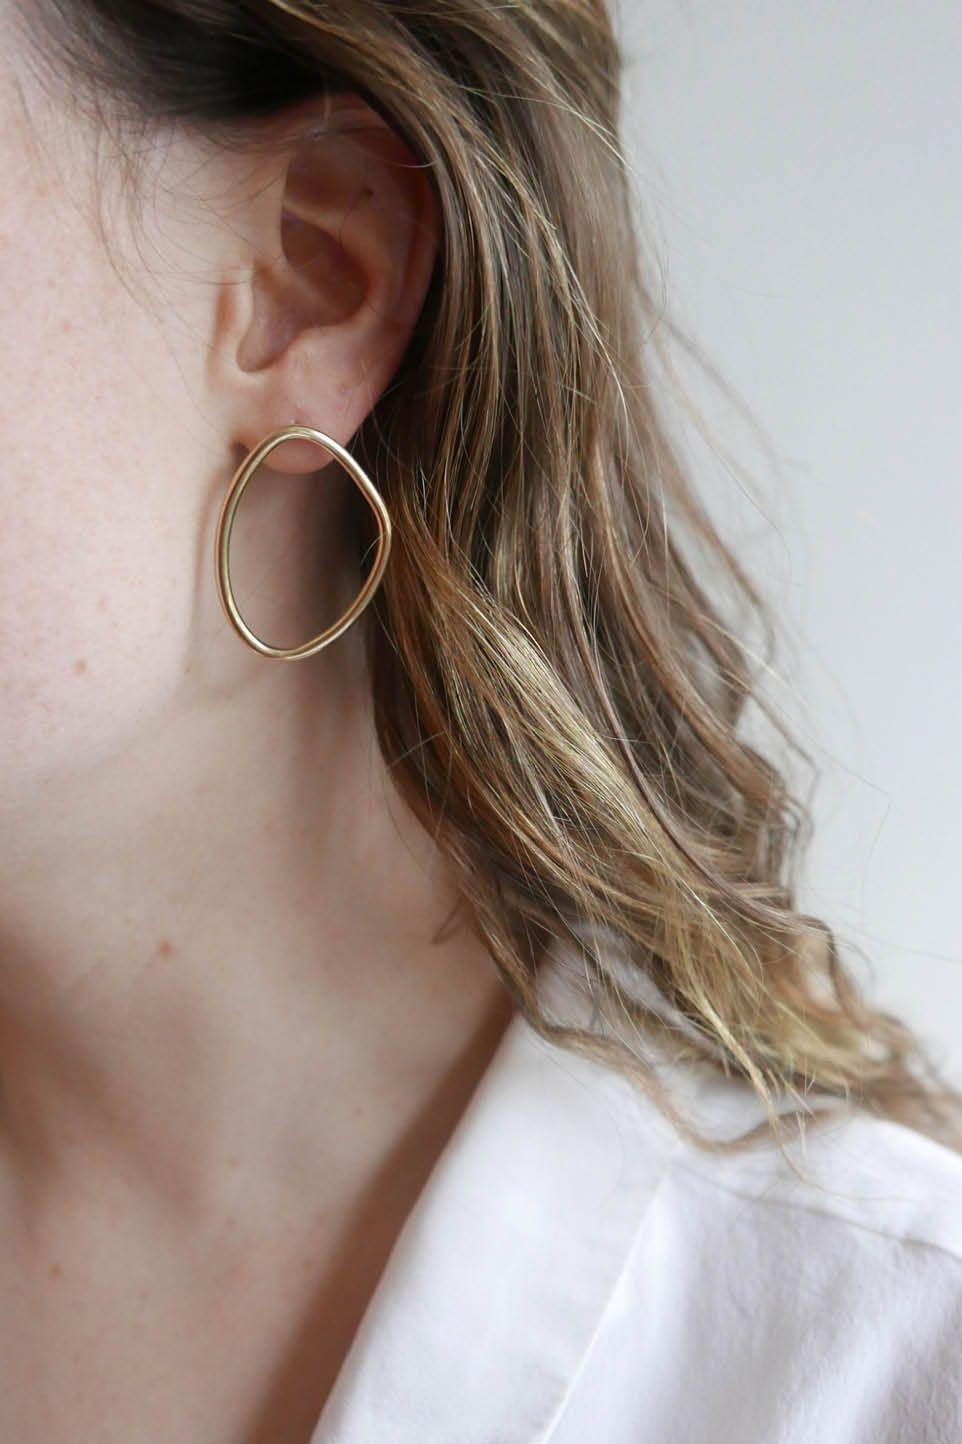 Petite Sabi Outline Studs | Ethical jewelry, Petite, Studs